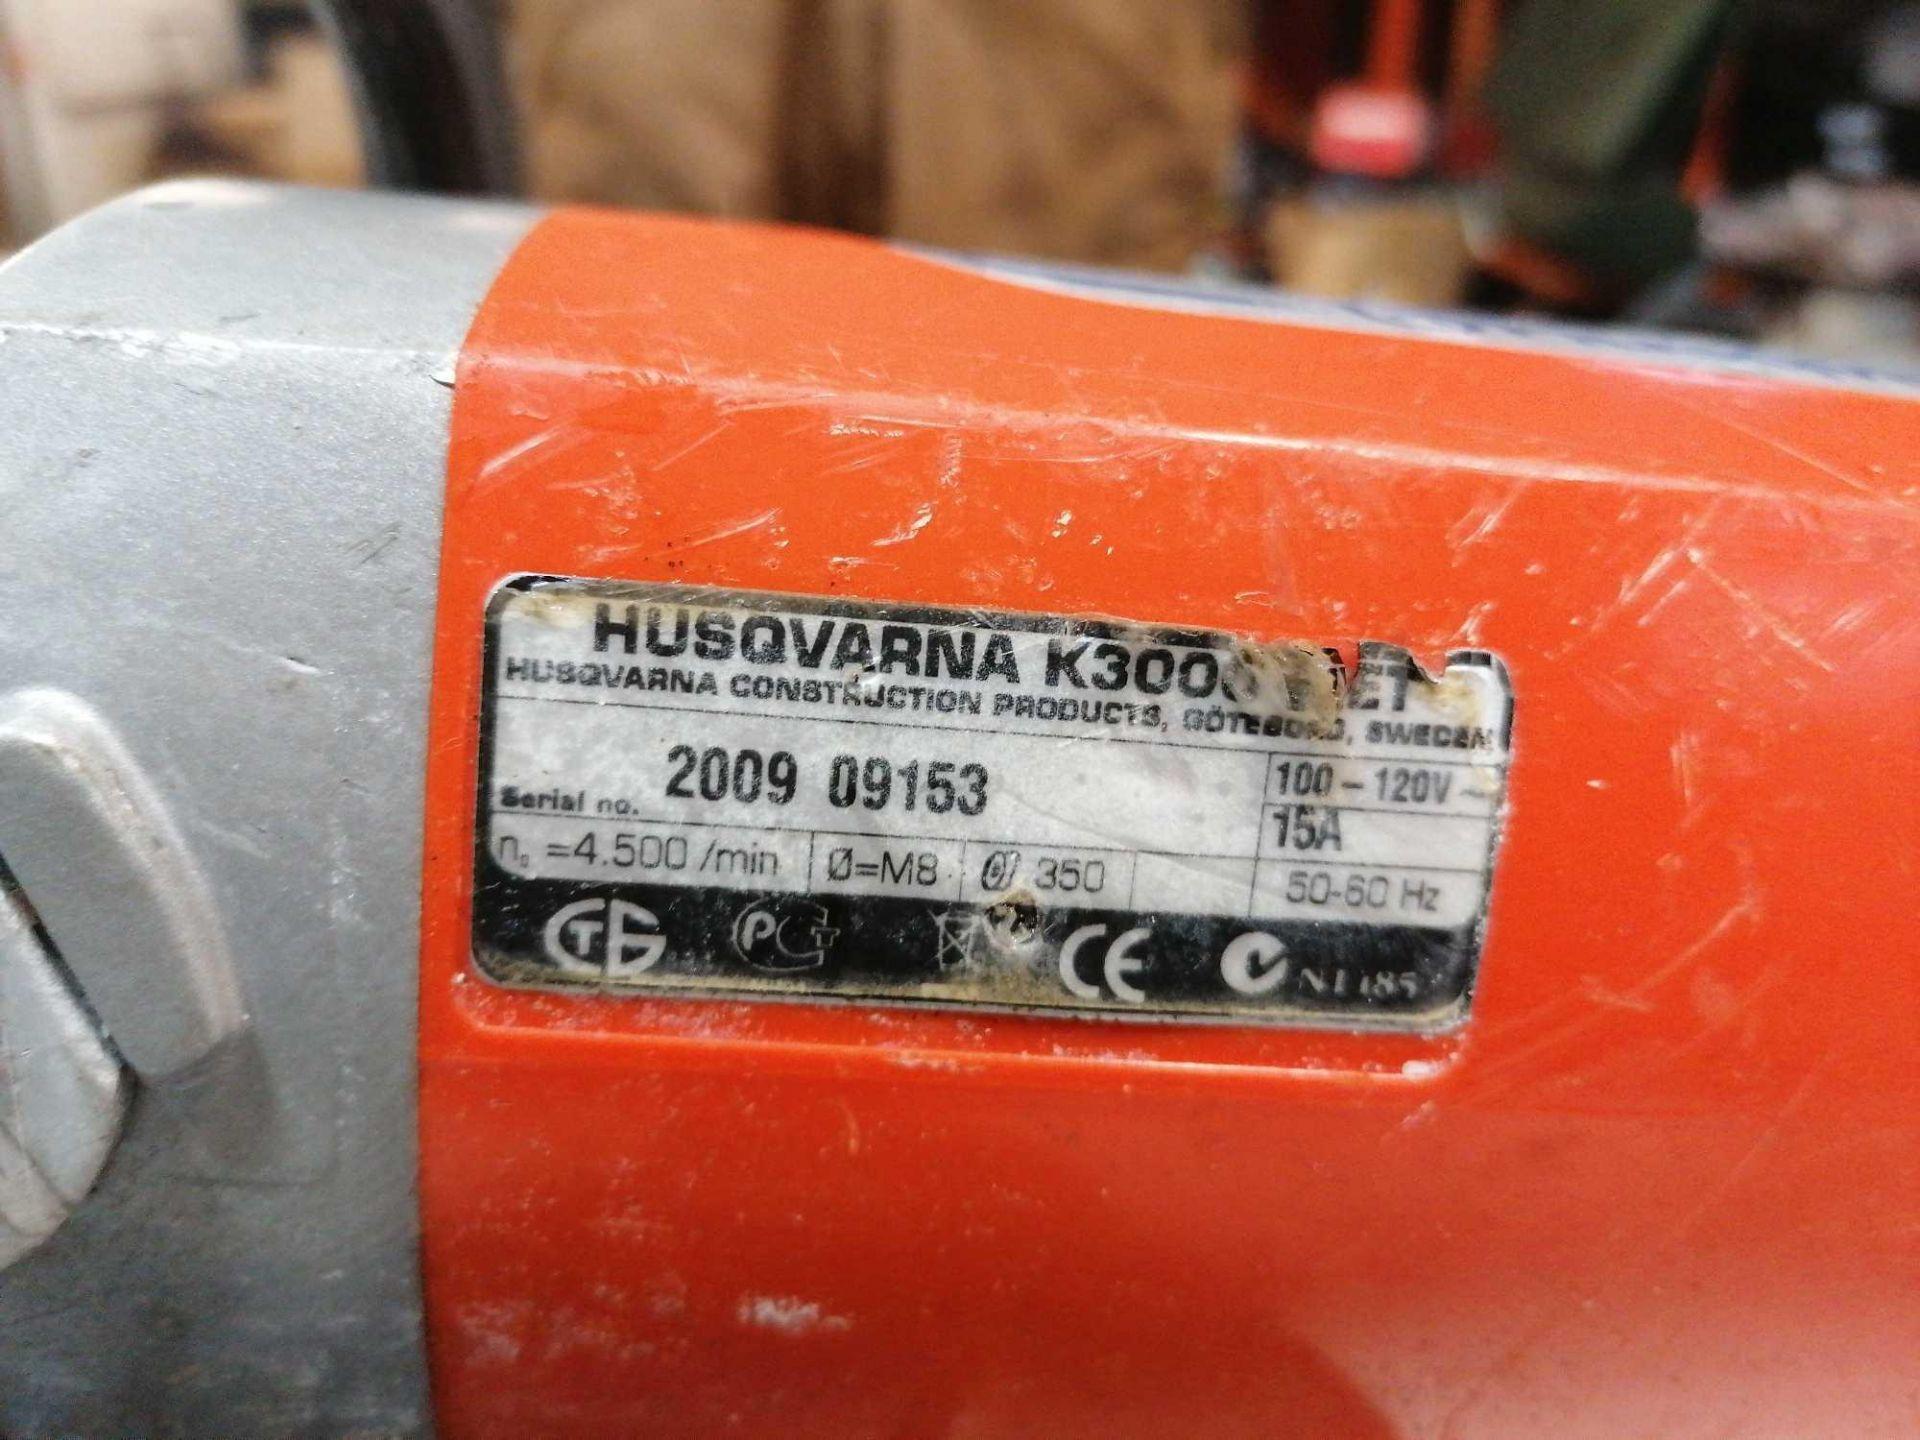 Lot 11 - 2009 Husqvarna K3000Concrete Saw